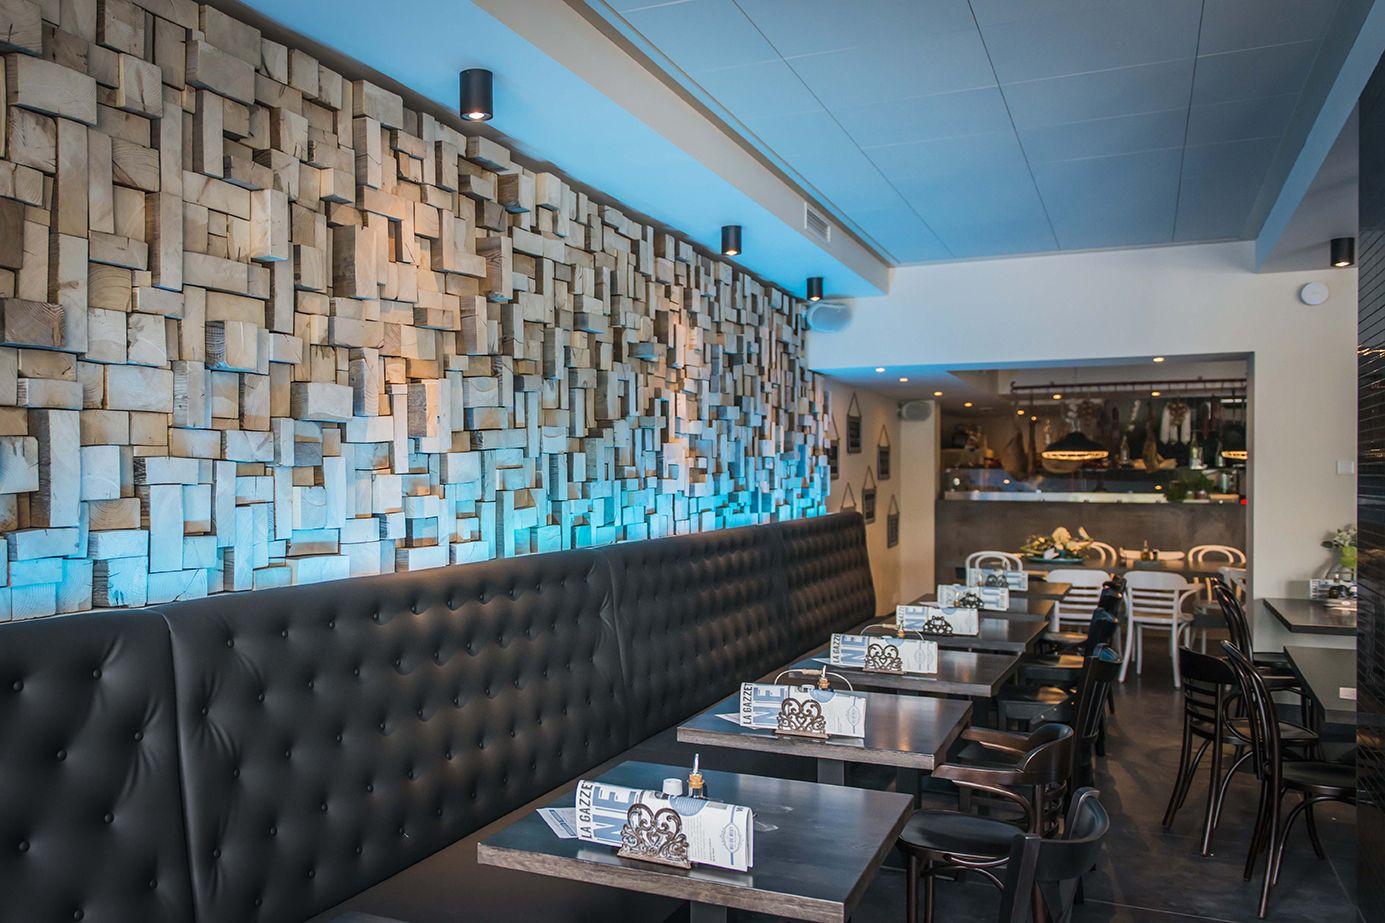 Briljant Blauw - Bij de Neut   Pizzeria   Pinterest   Restaurants ...